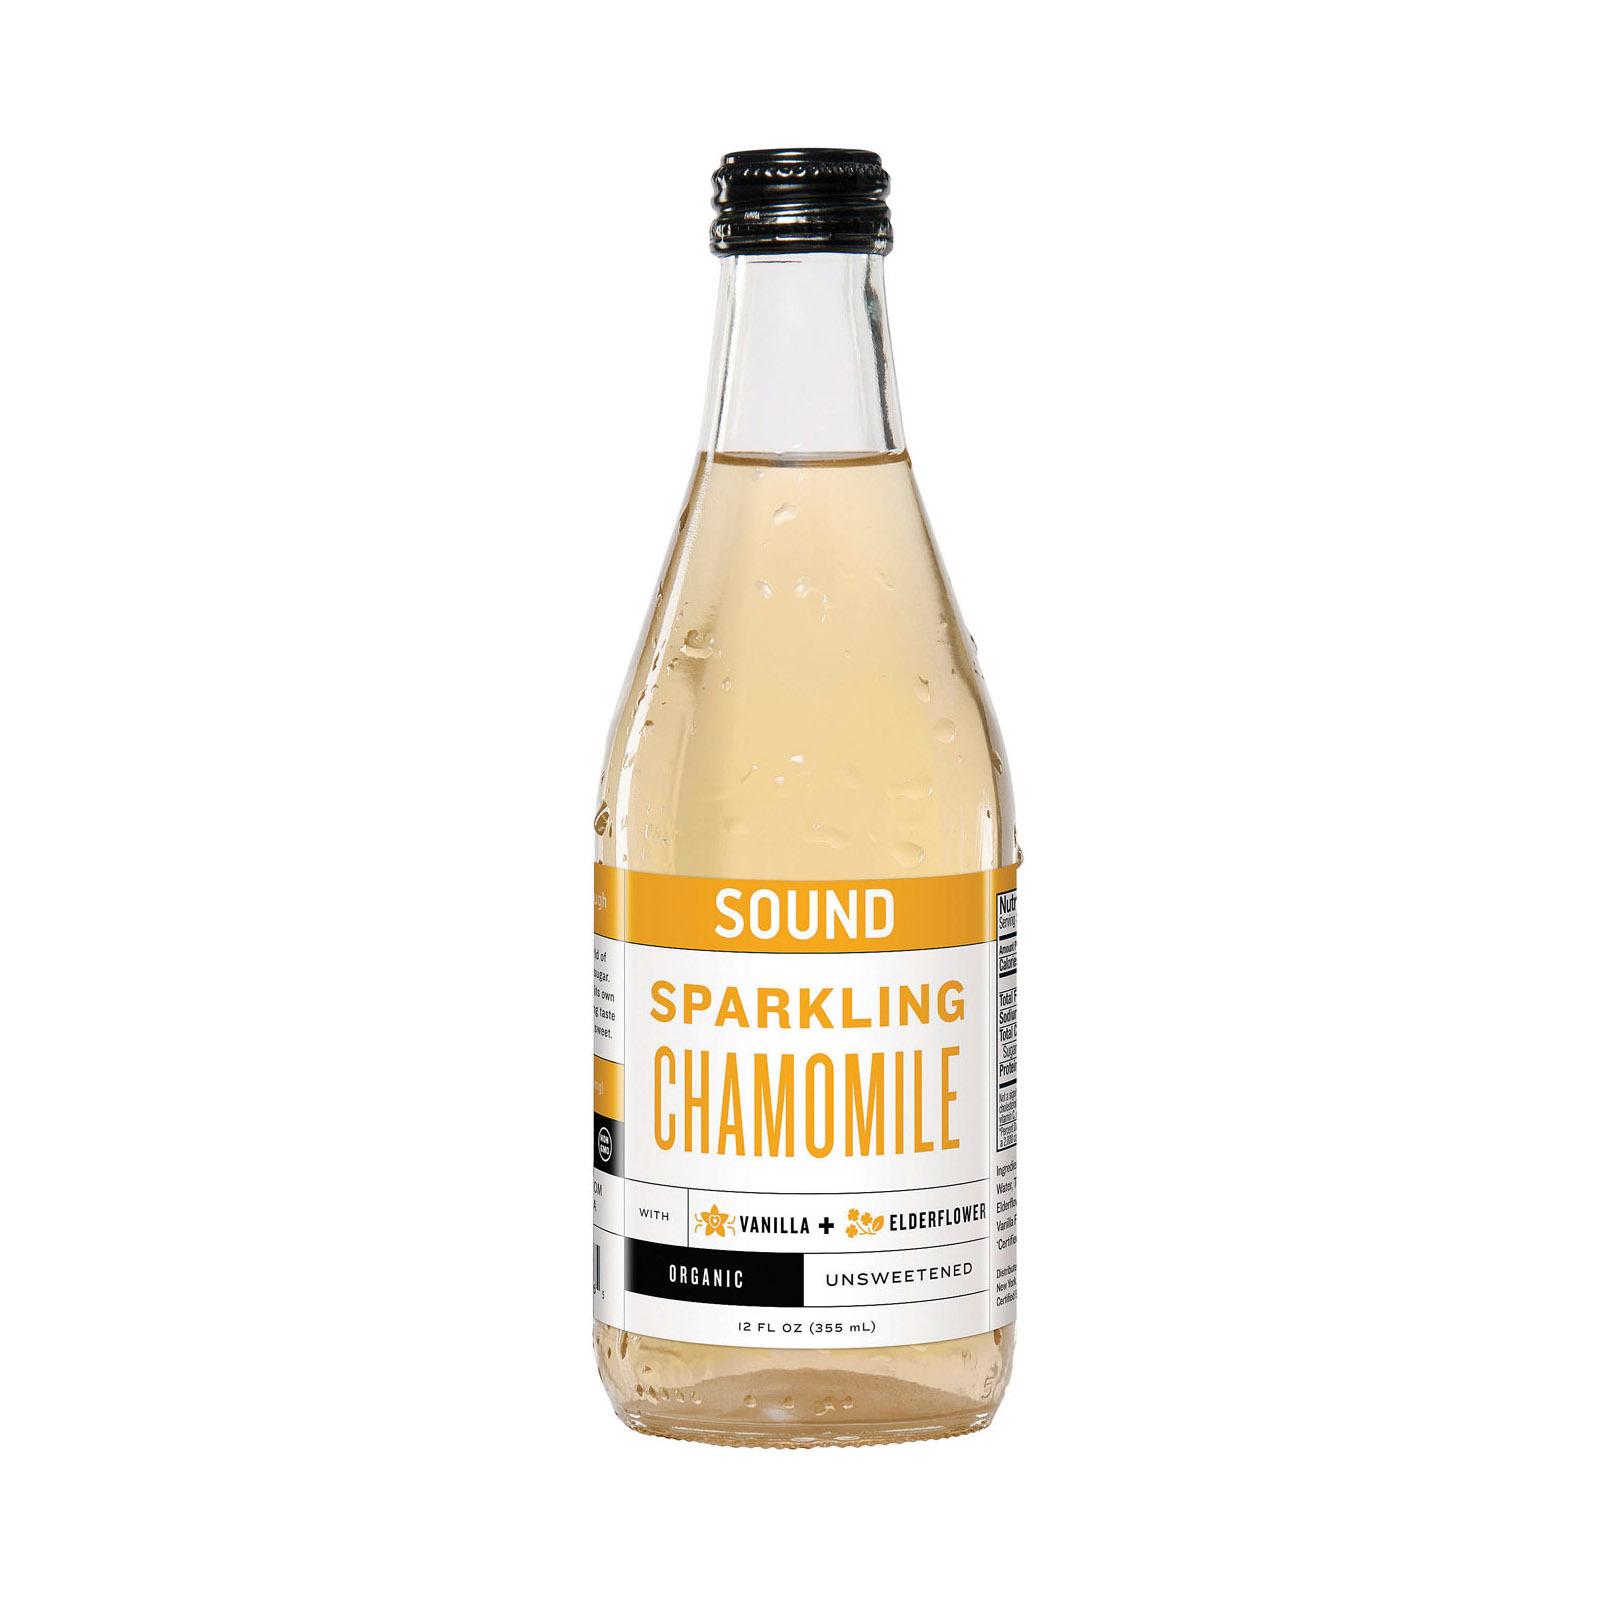 Sound Sparkling Tea Tea - Organic - Sparkling - Chamomile - Case of 12 - 12 fl oz